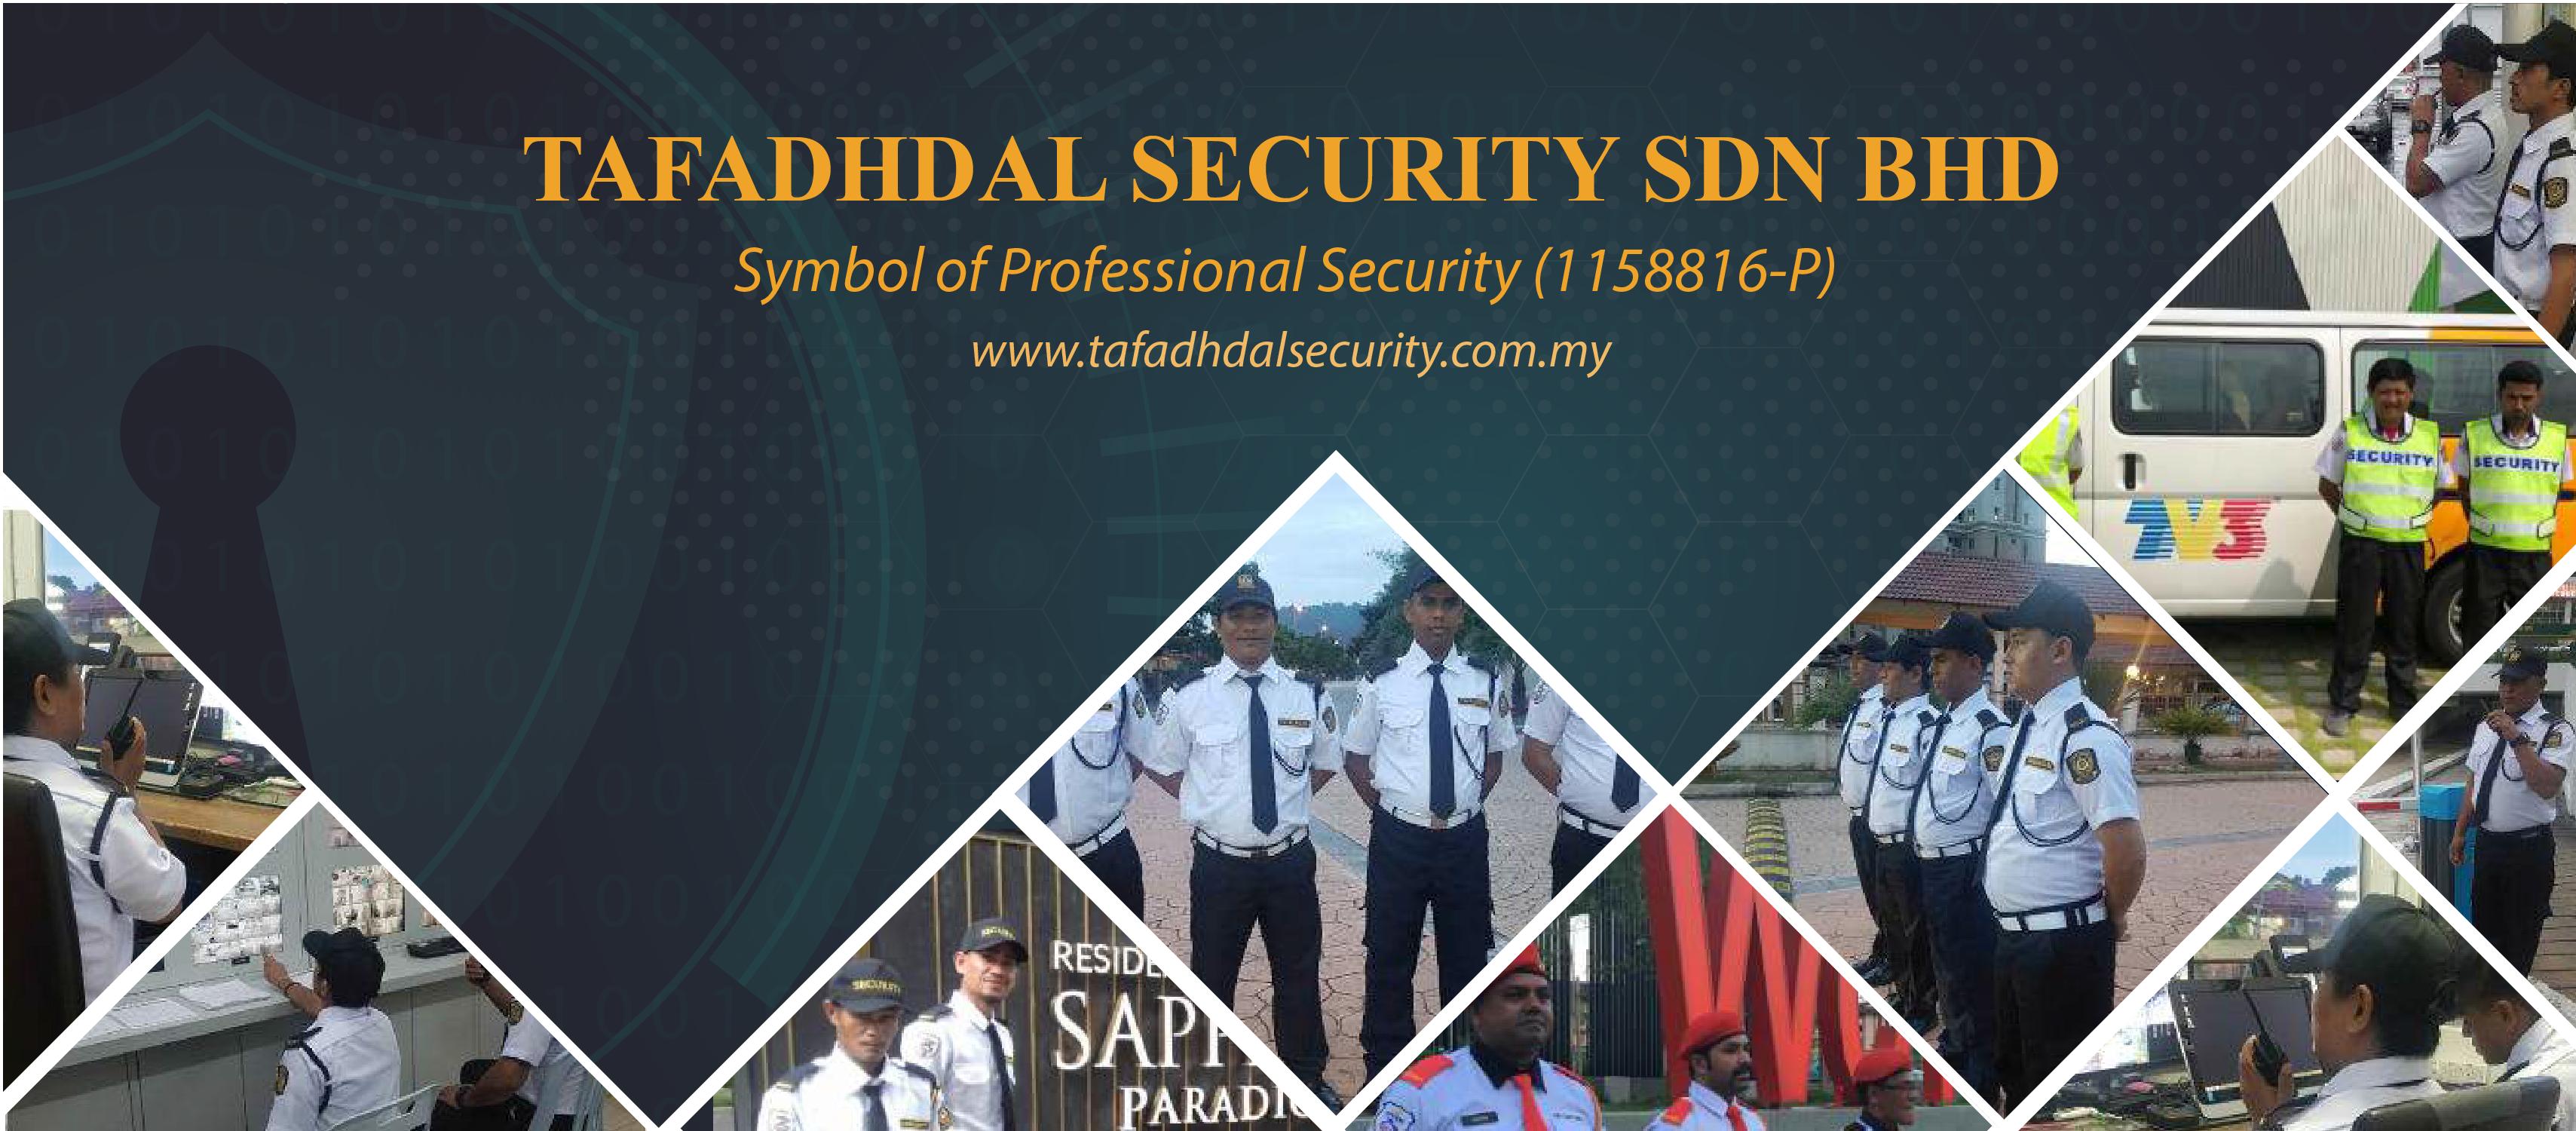 tafadhdal security